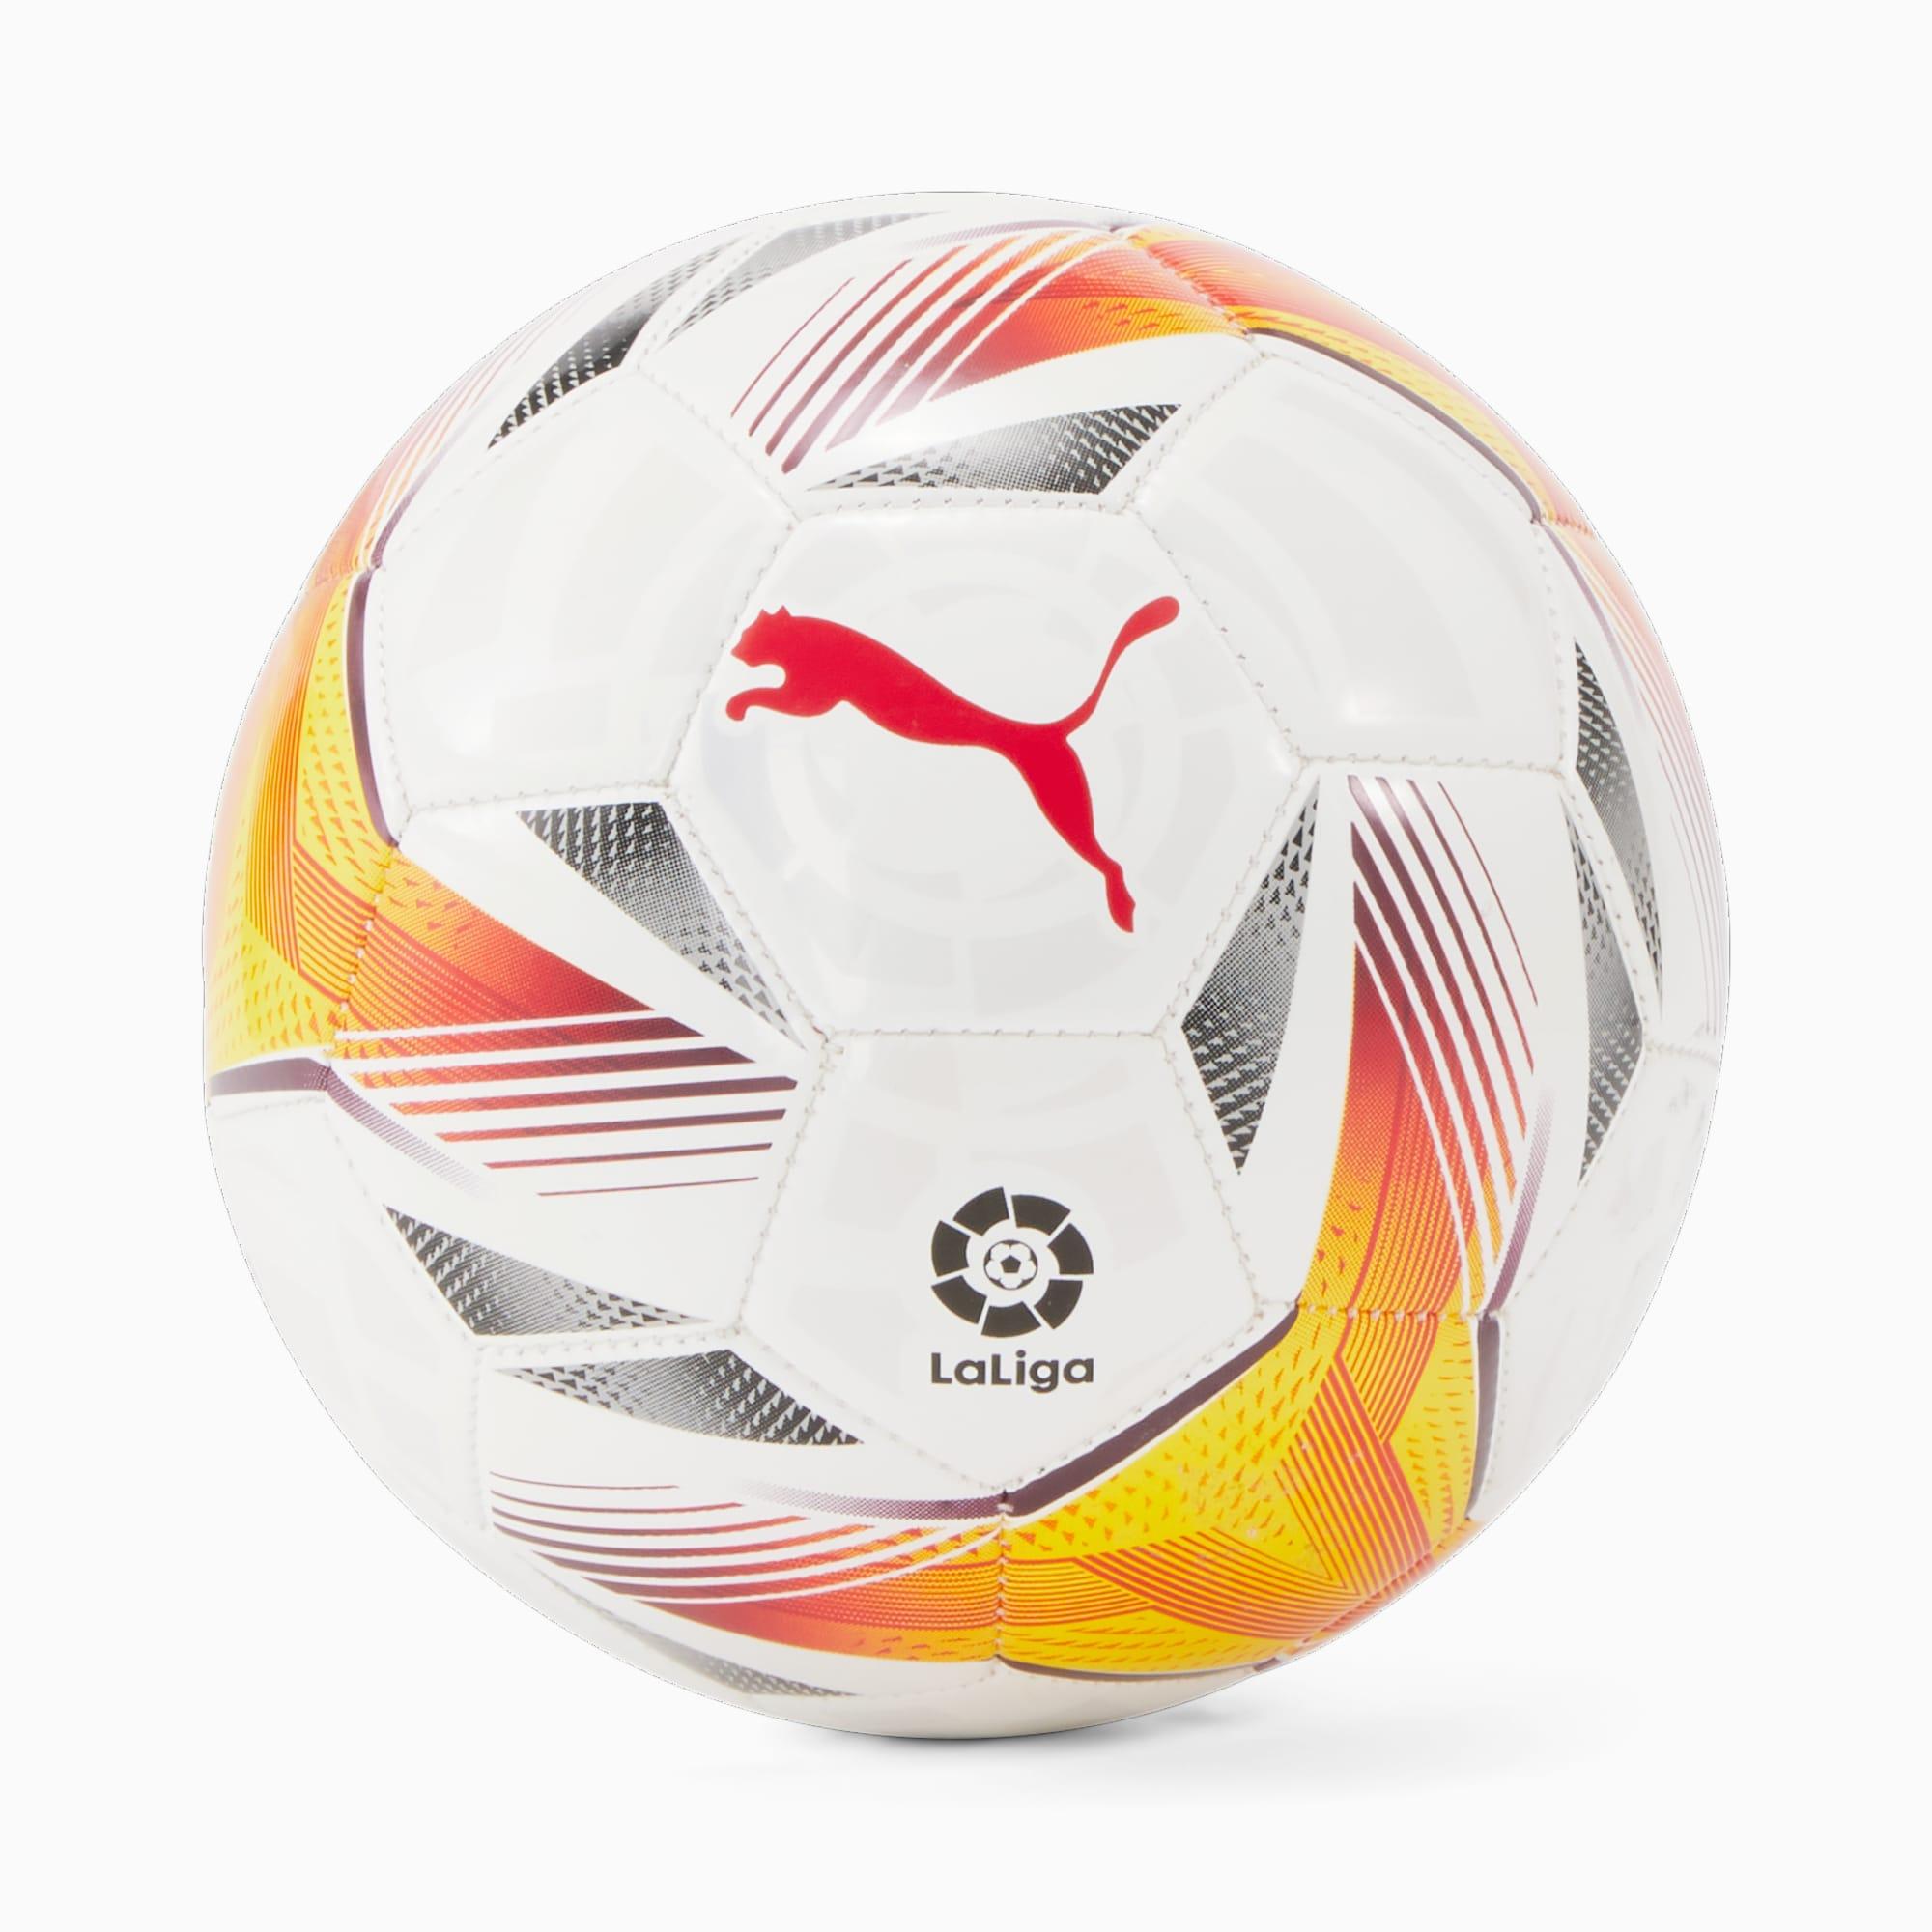 La Liga 1 Accelerate Mini Ball